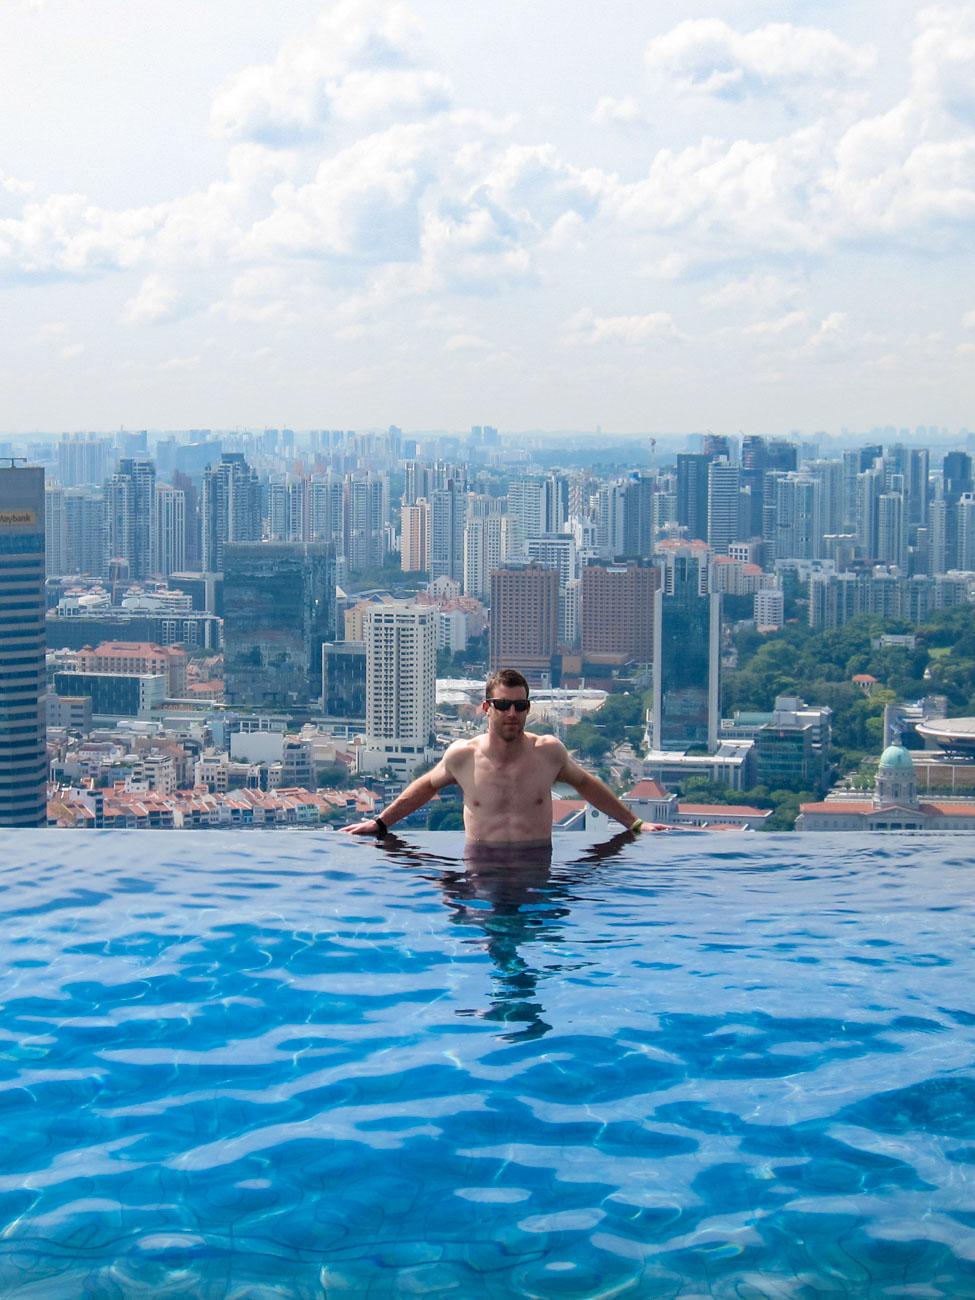 Marina Bay Sands Infinity Pool - Singapore